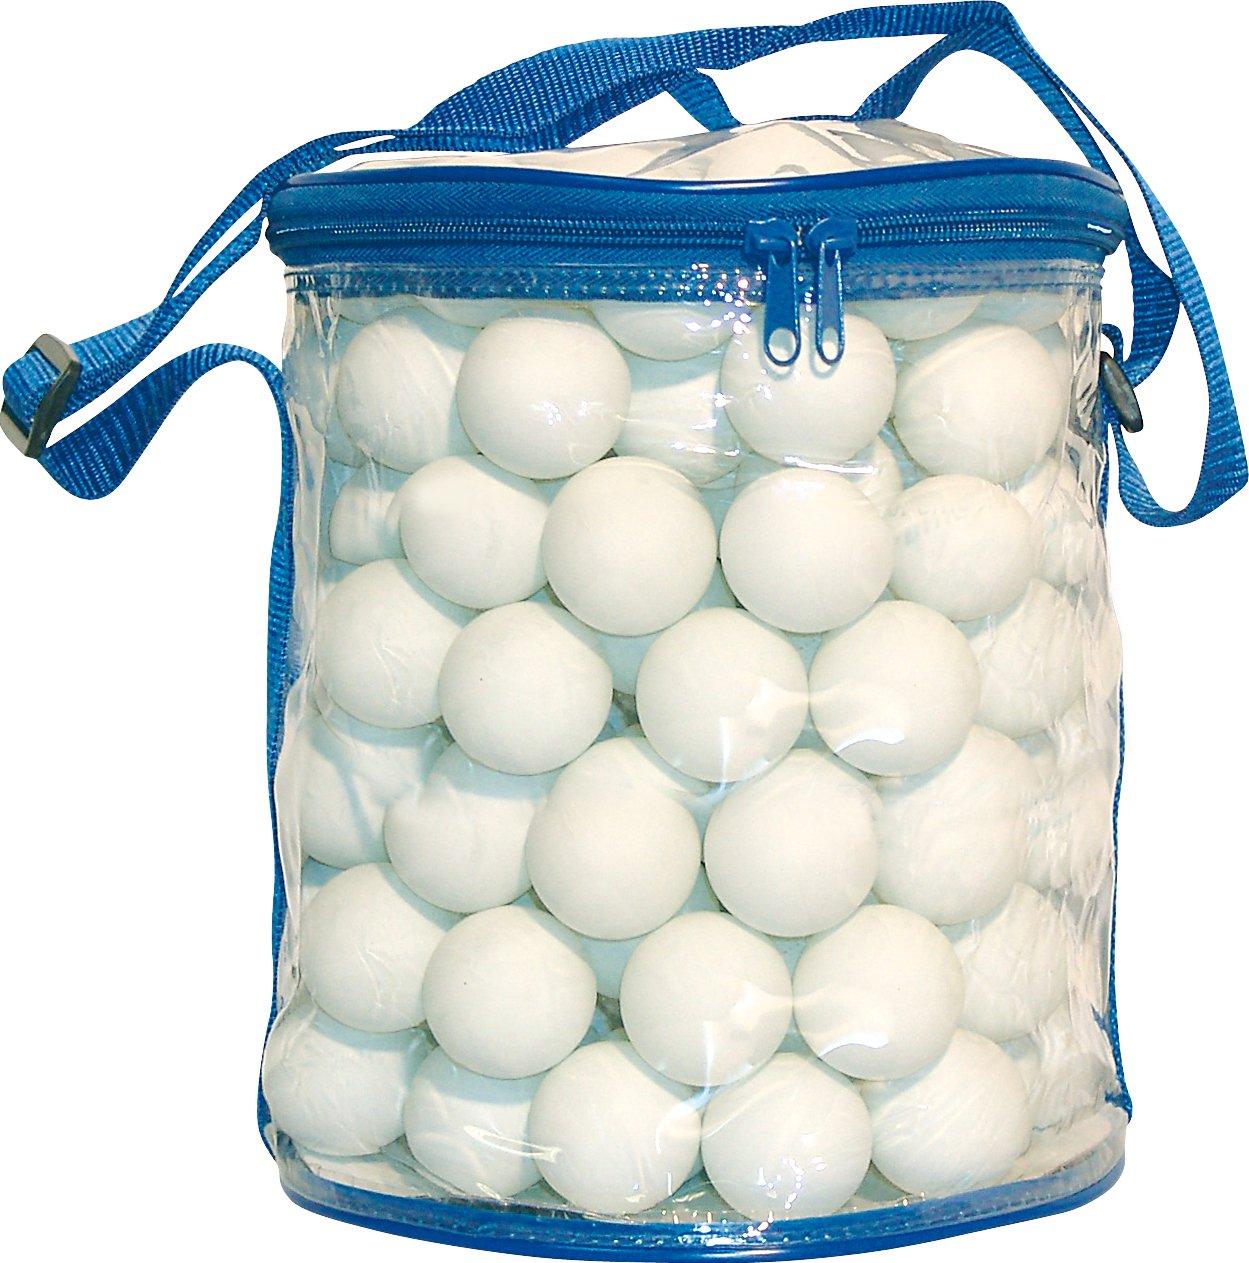 sunflex sport - Borsa con 144 palline da ping pong 30011